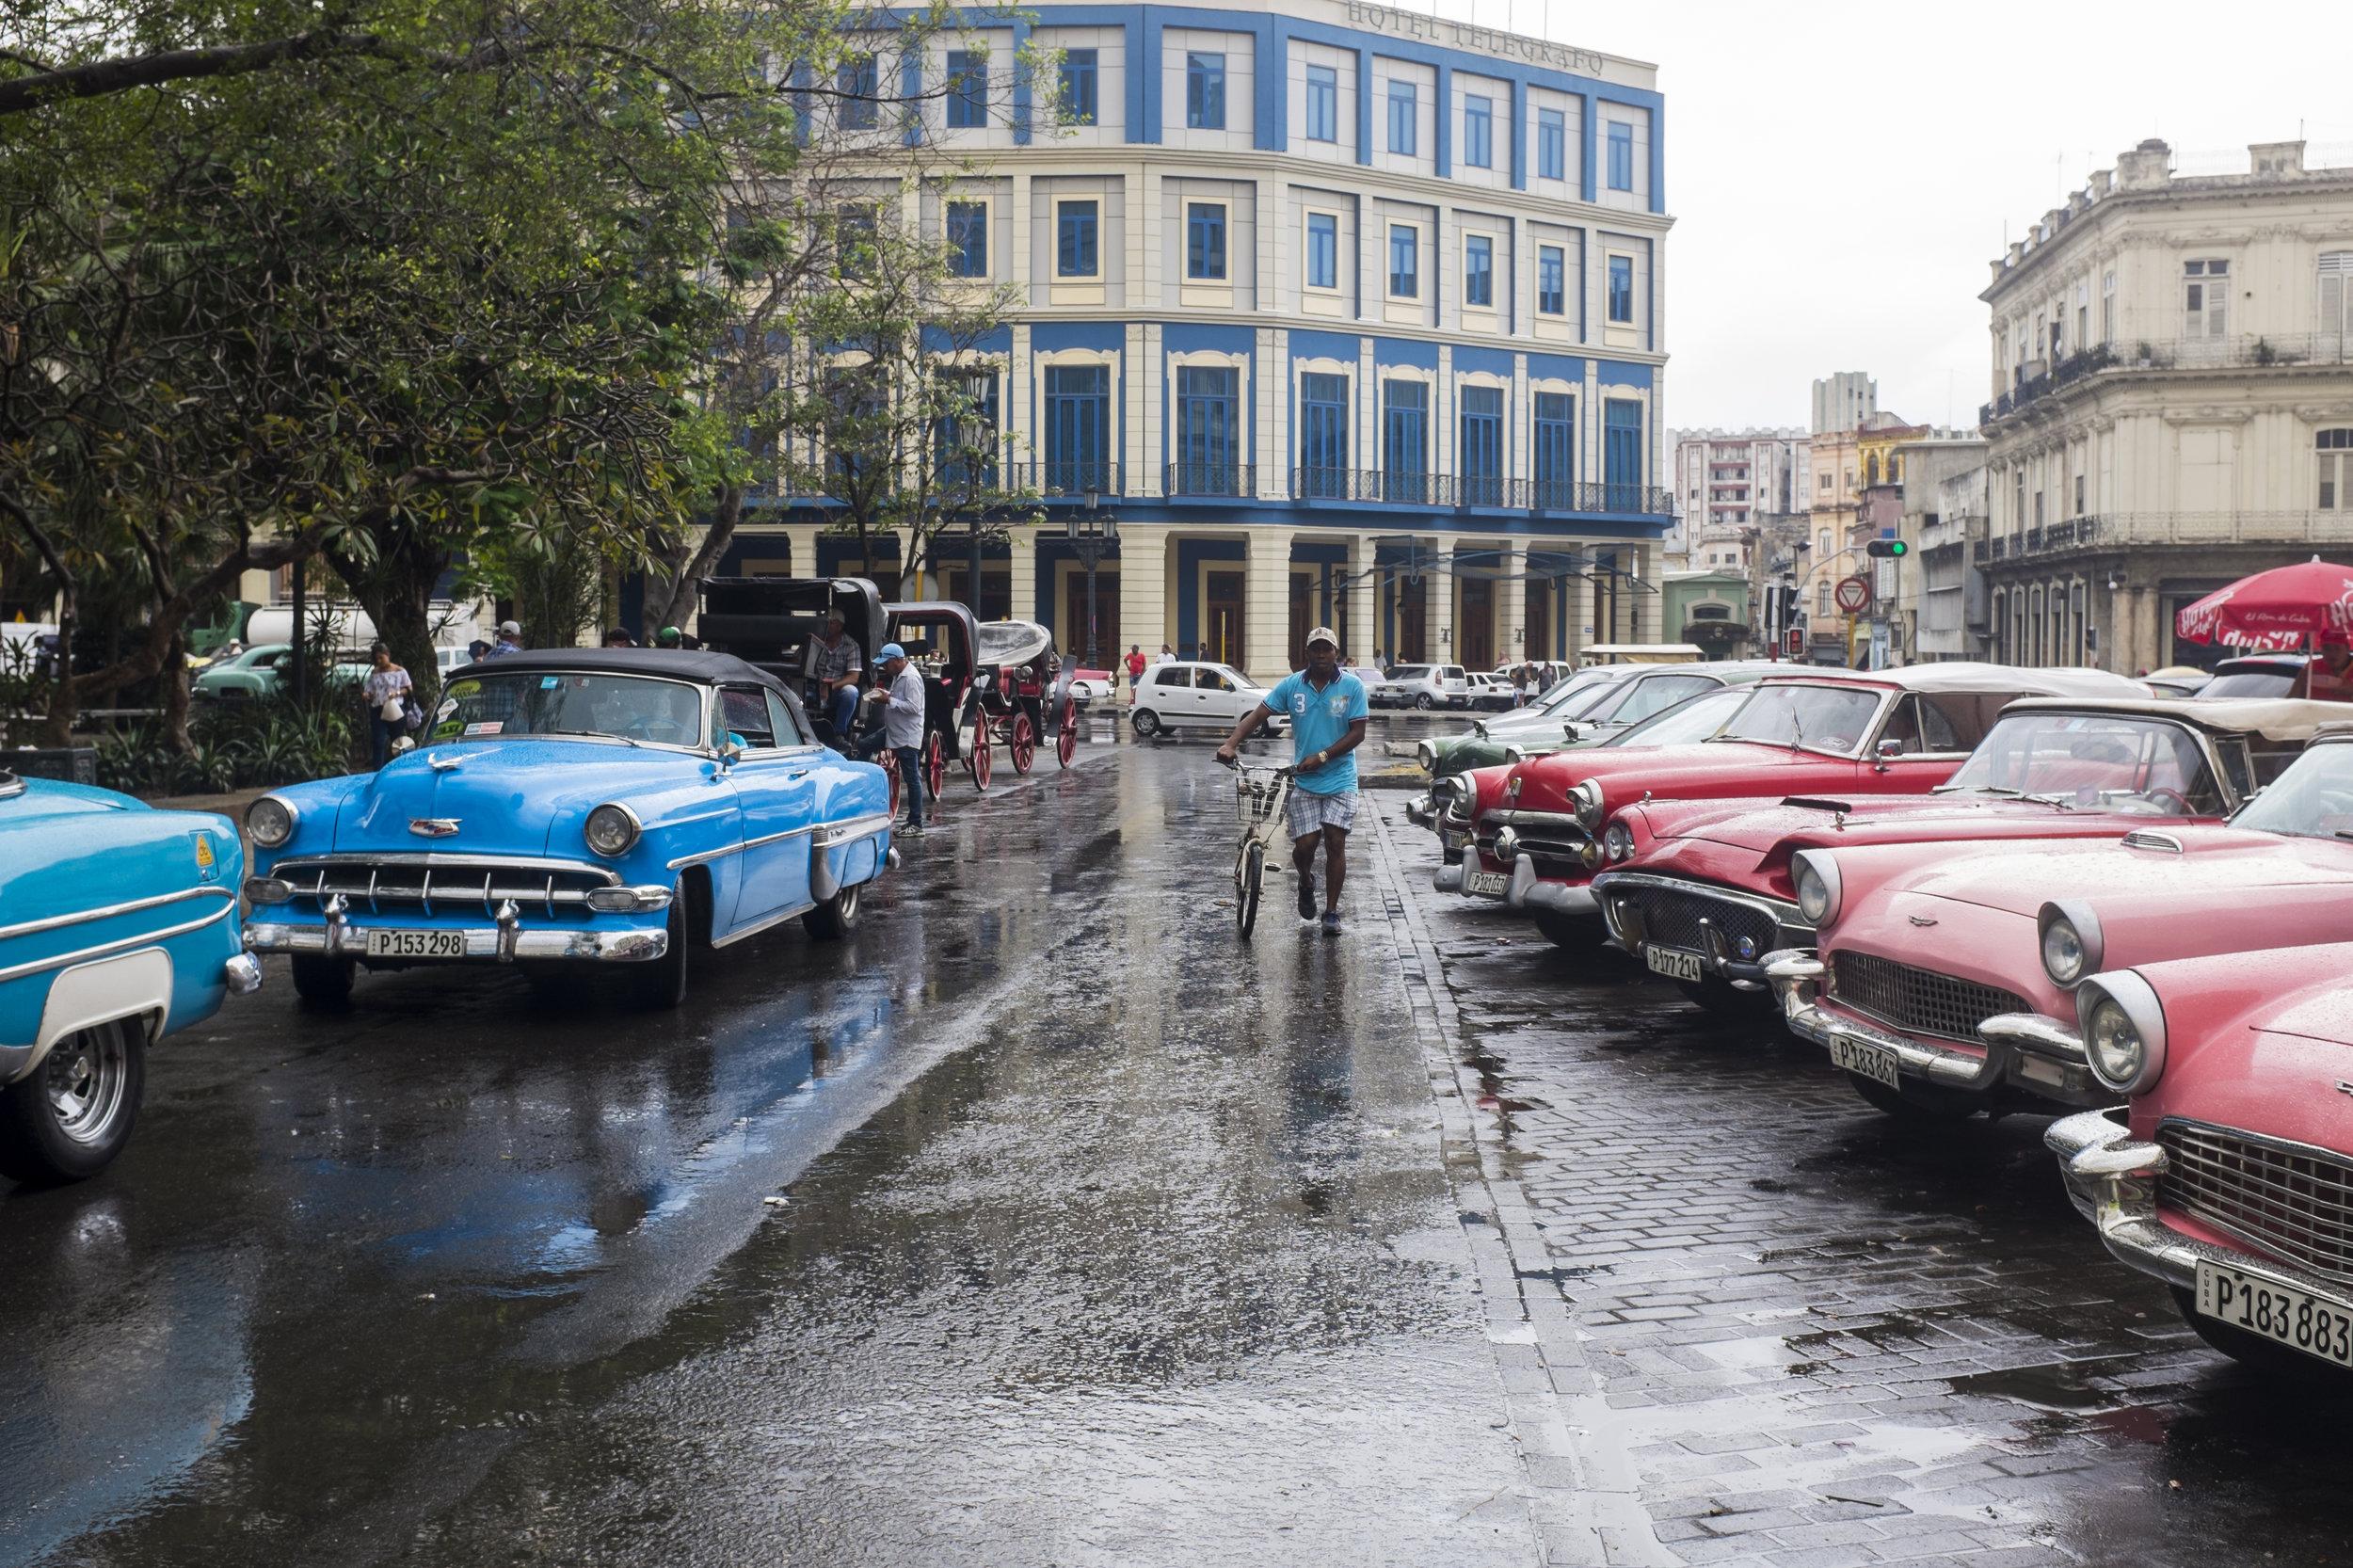 Cars in Rain (Turned) copy.JPG